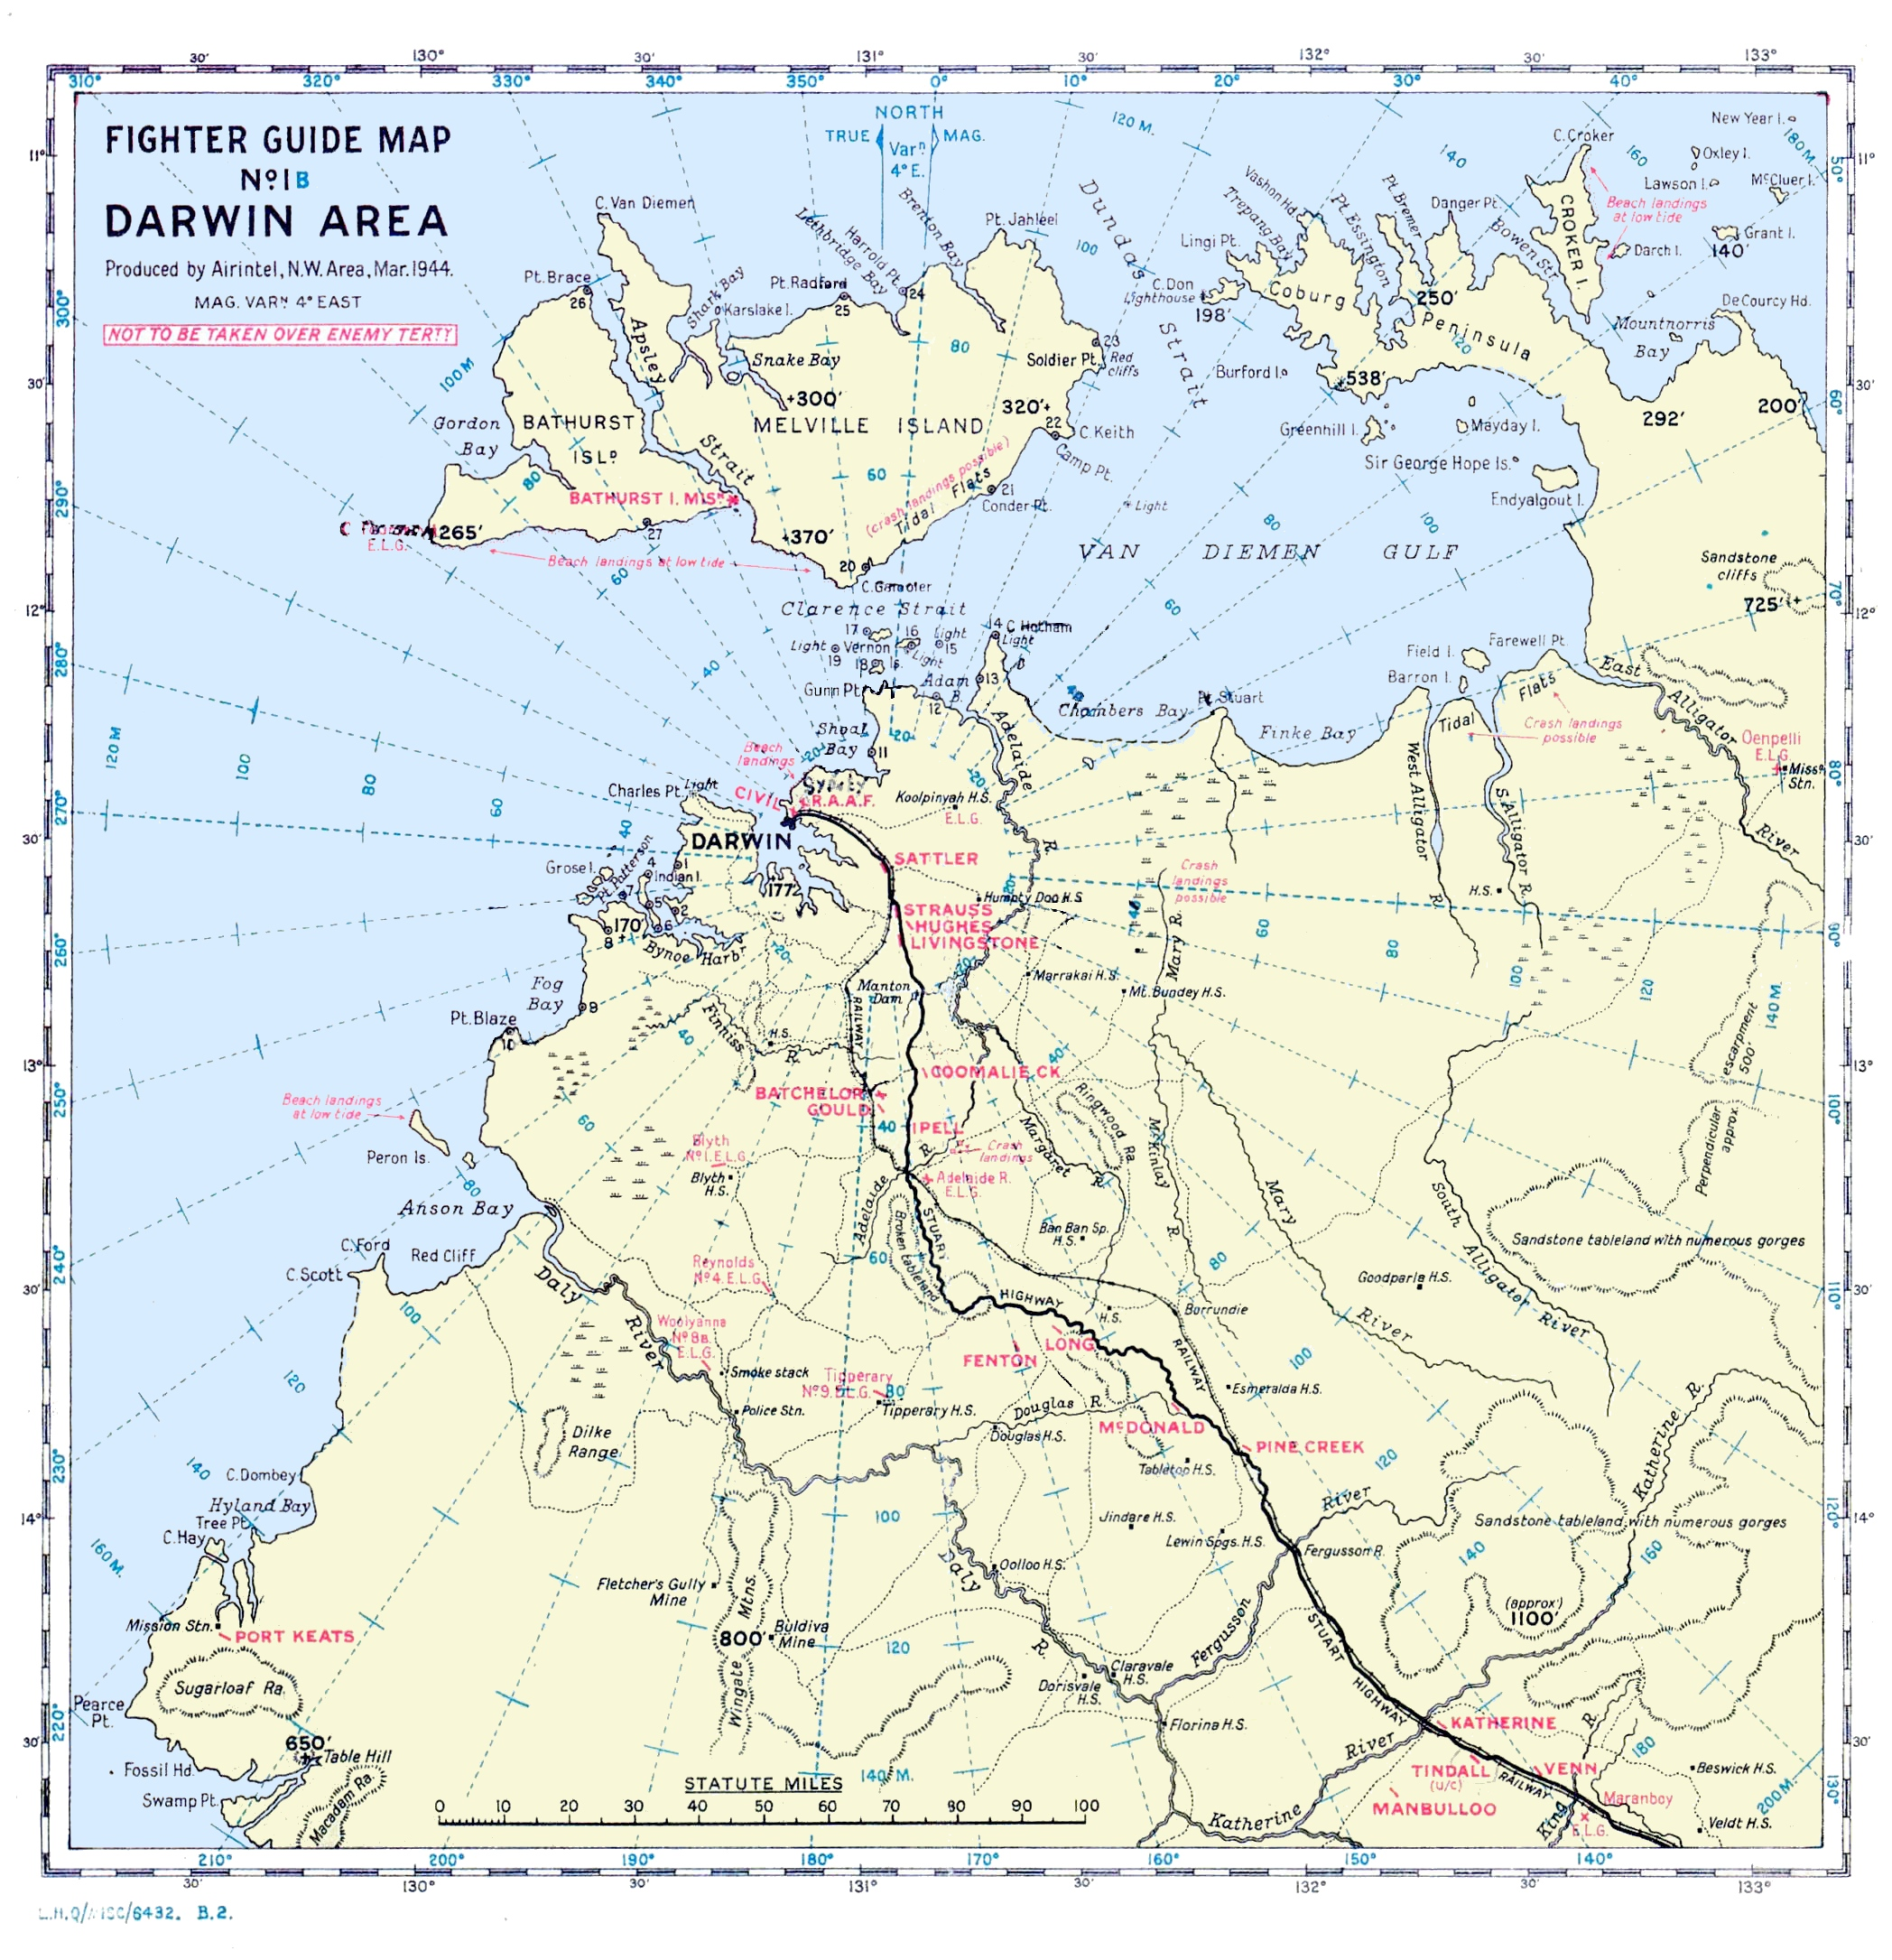 FileDarwin air defence map 1944jpg Wikimedia Commons